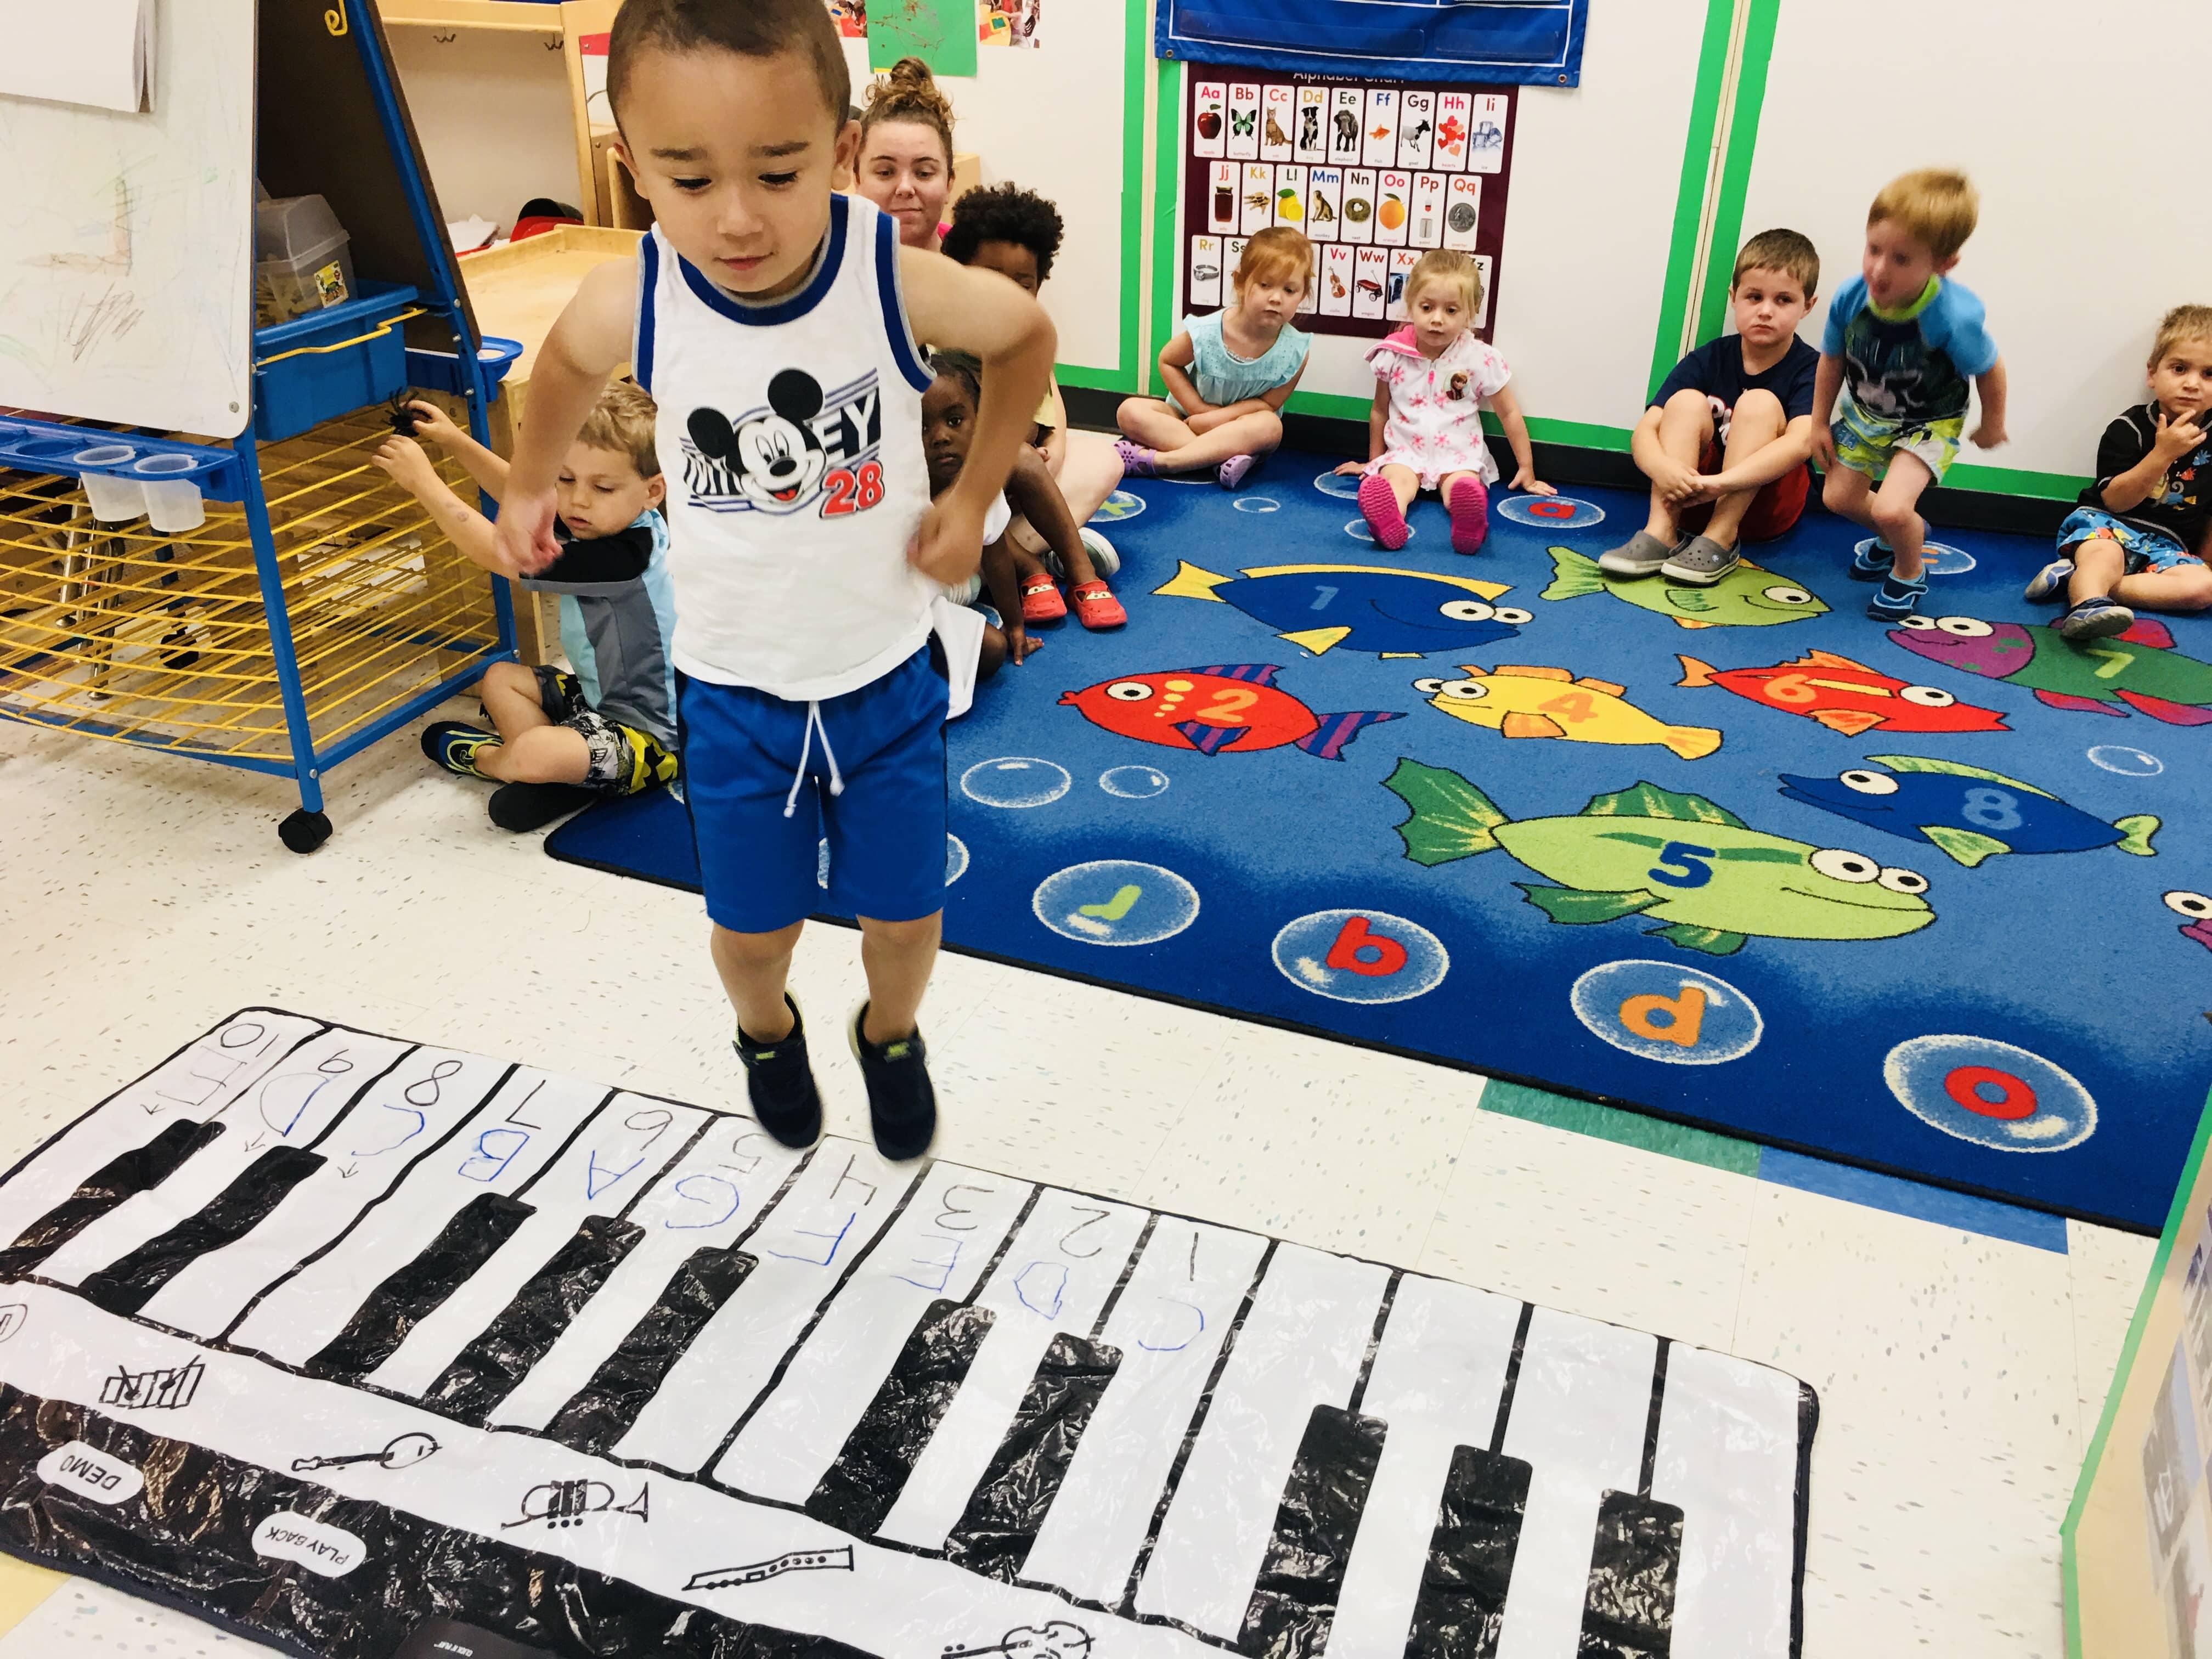 Boy Playing Floor Piano 2